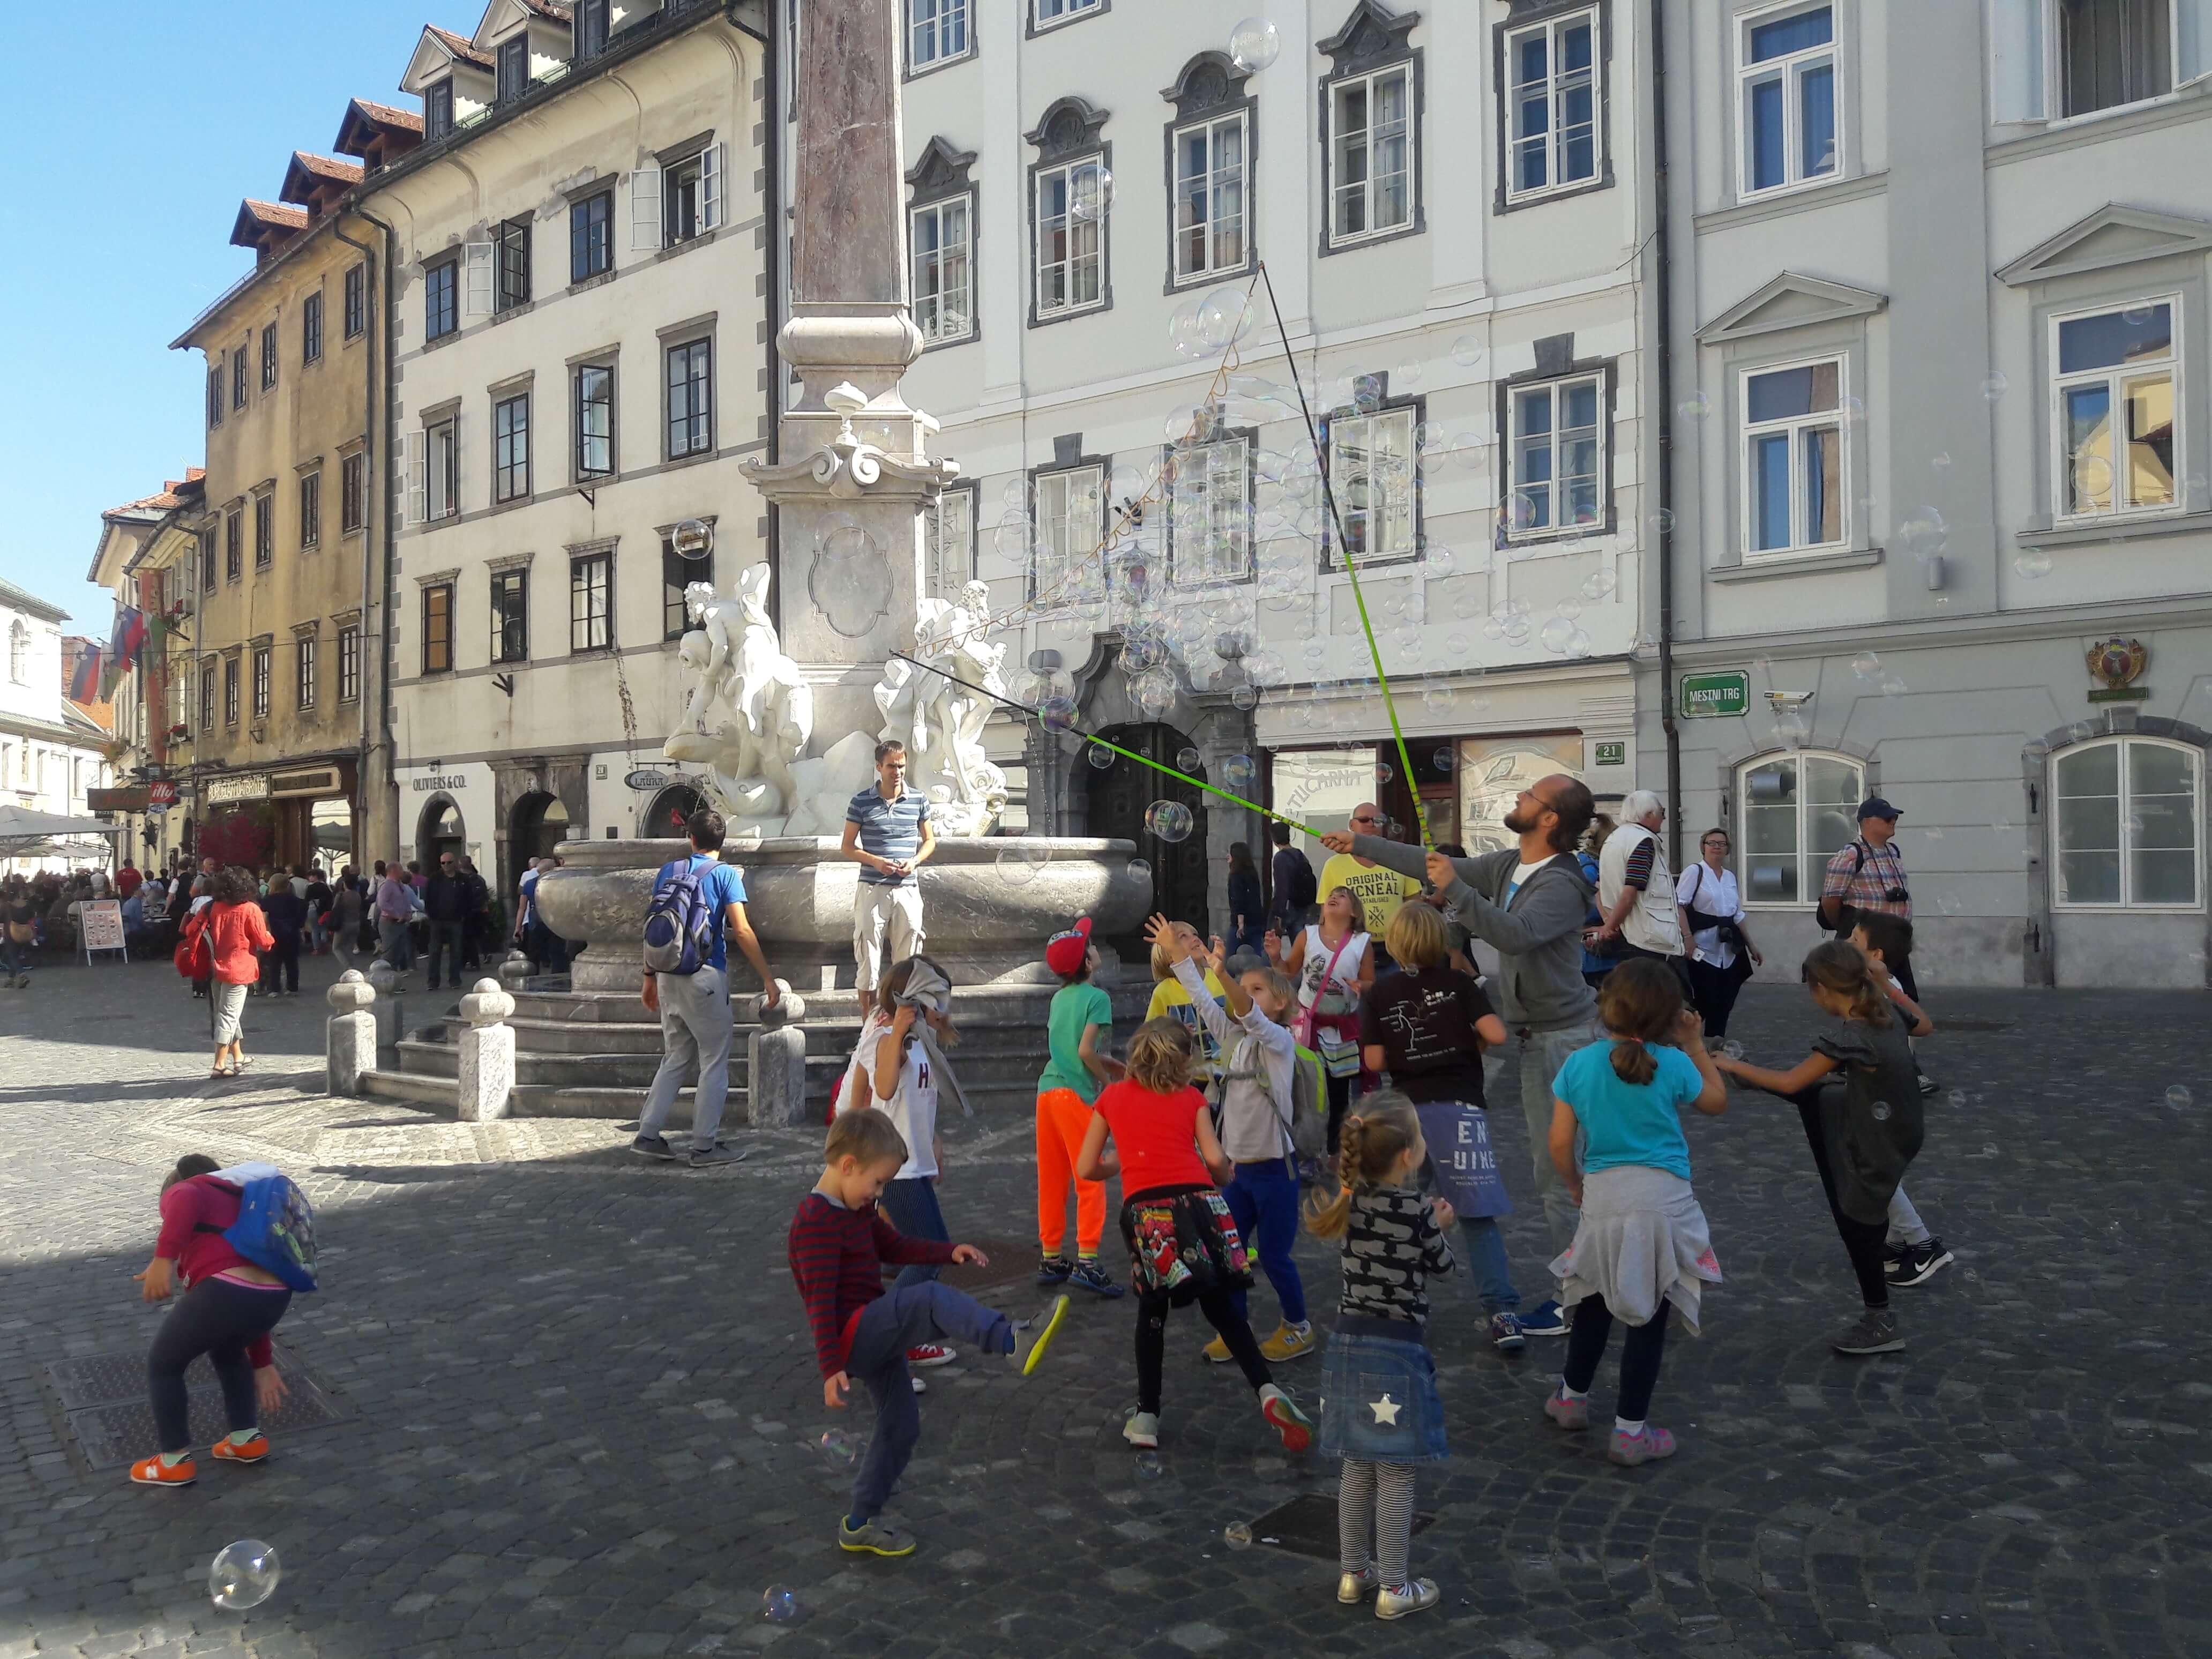 Pelas ruas da Antiga Liubliana